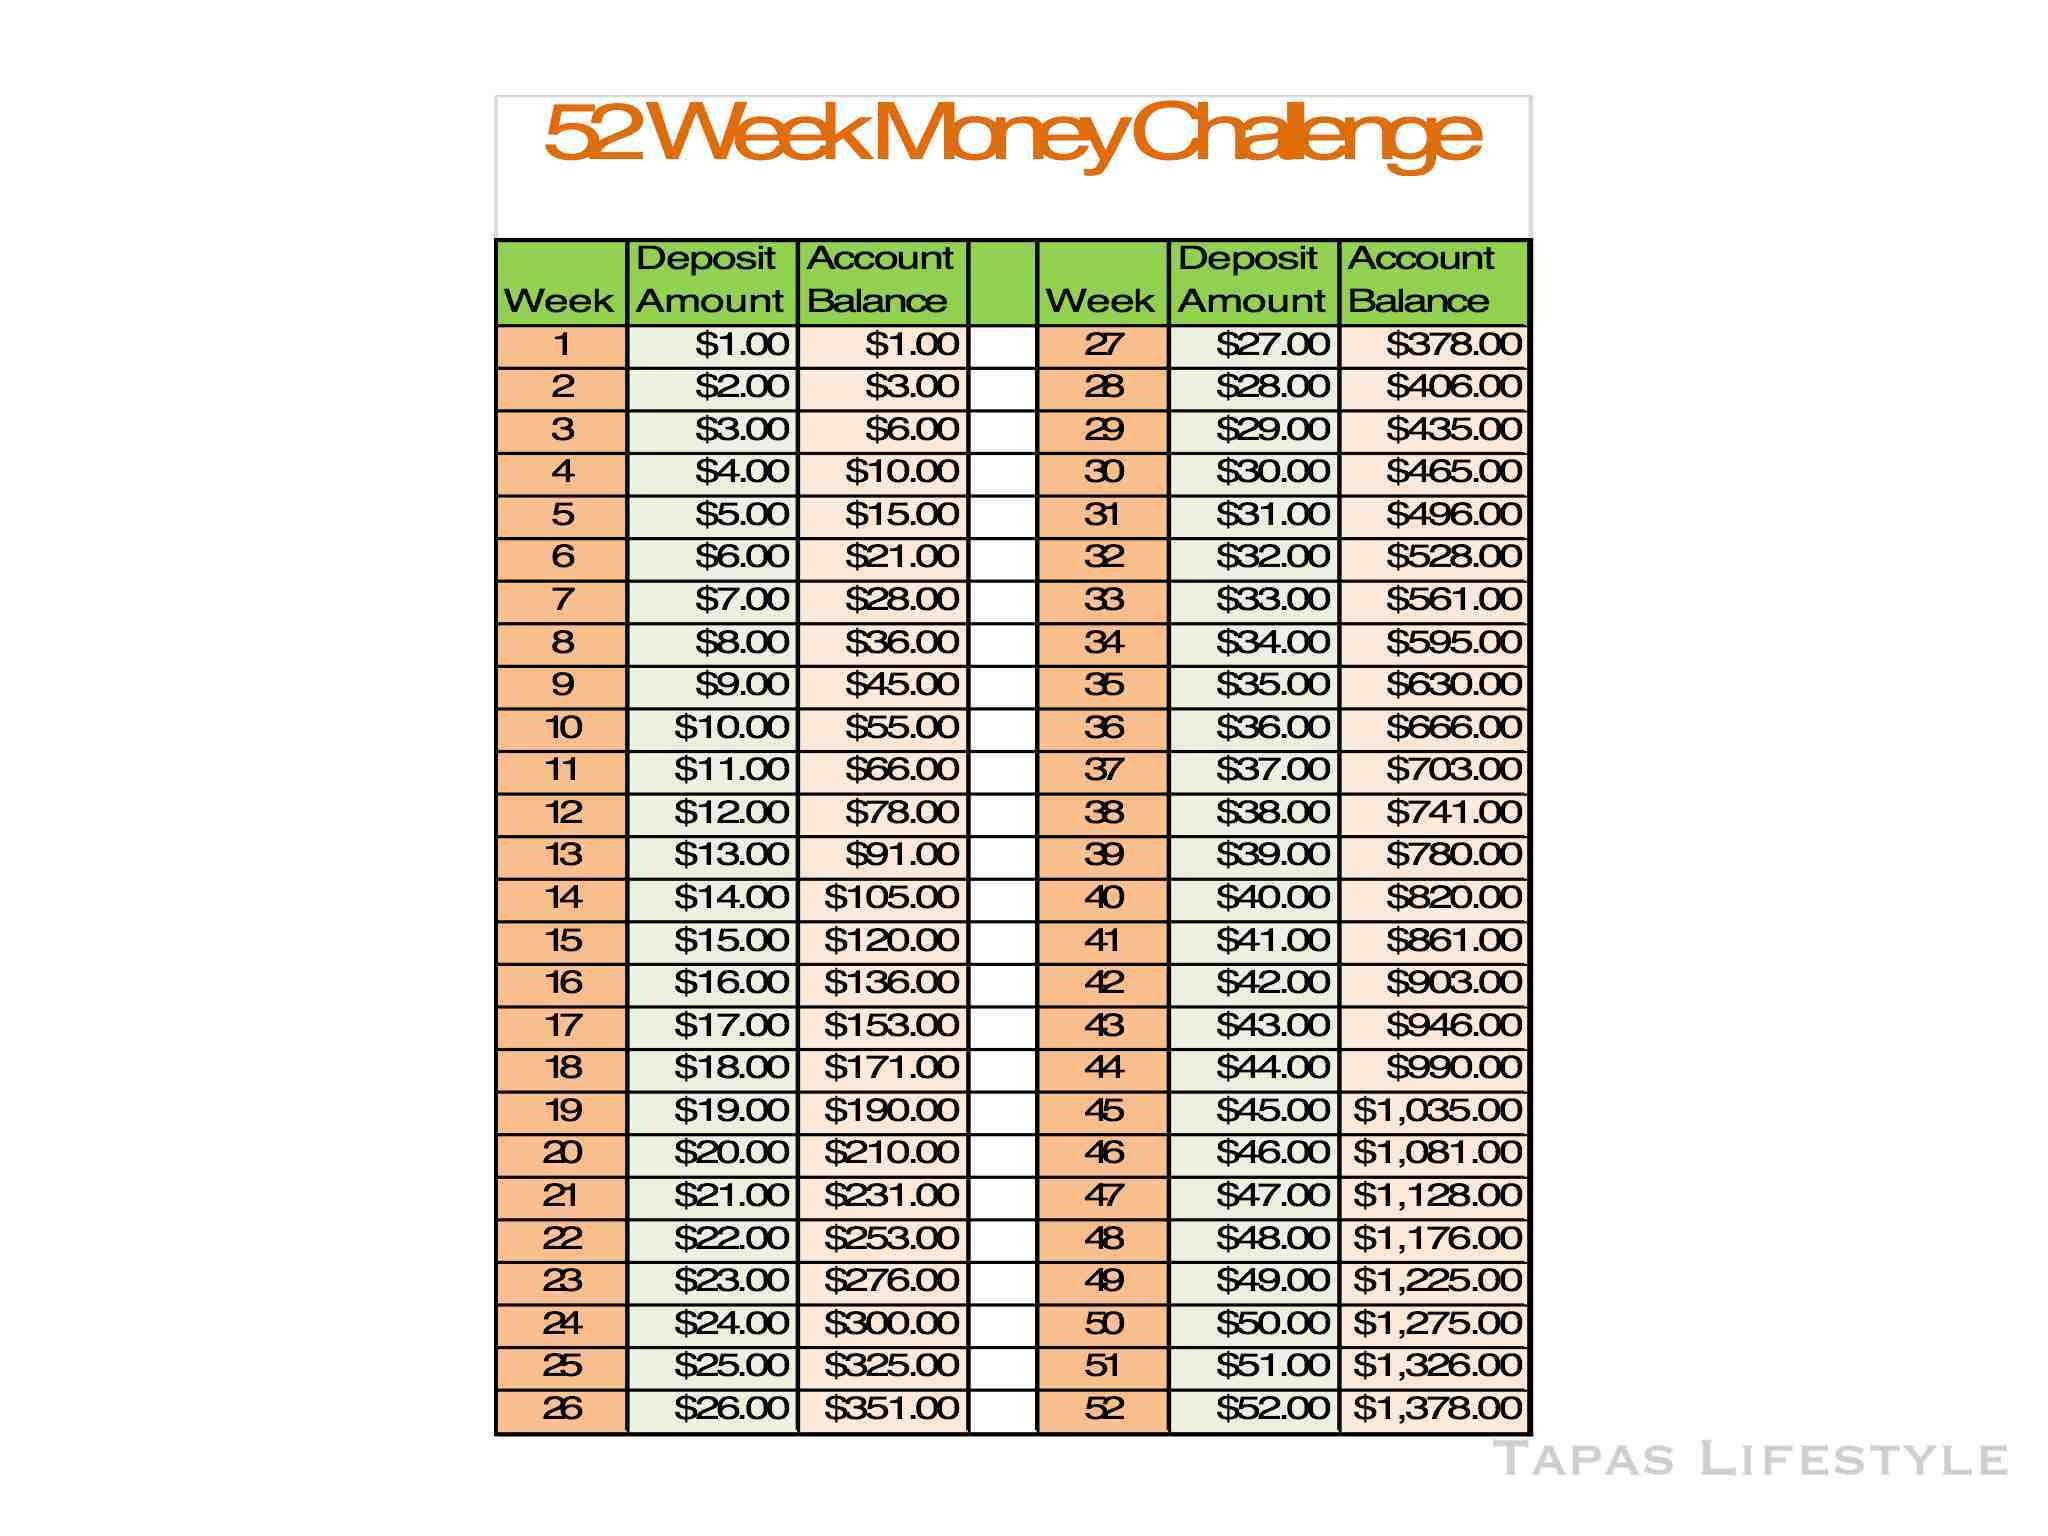 52 Week Money Challenge Excel Template 23793 | DFILES